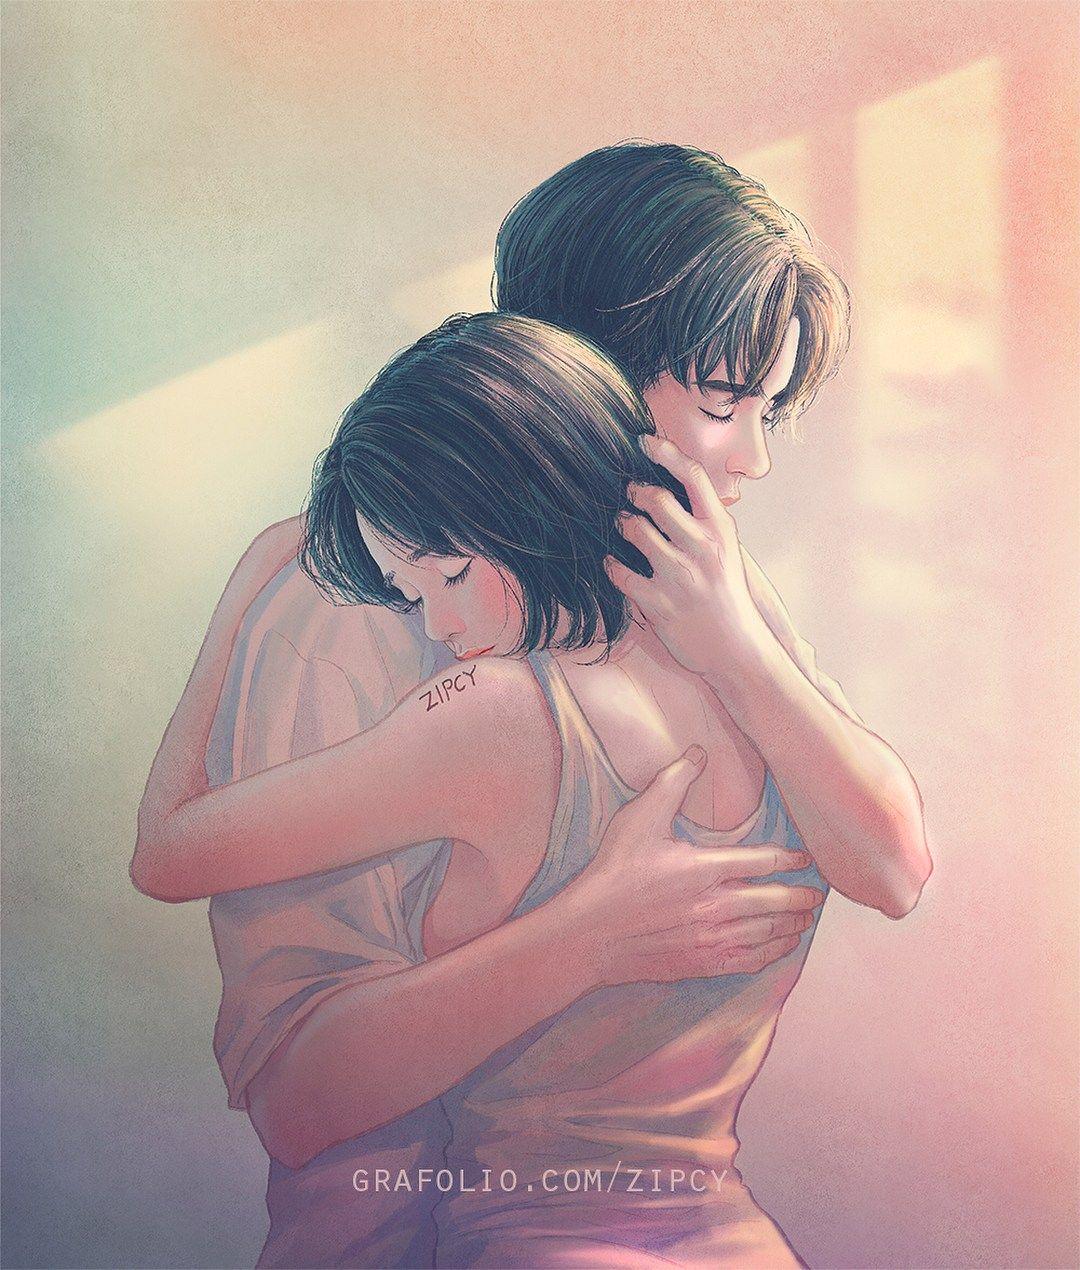 Zipcy illustrator of heart touching world of love